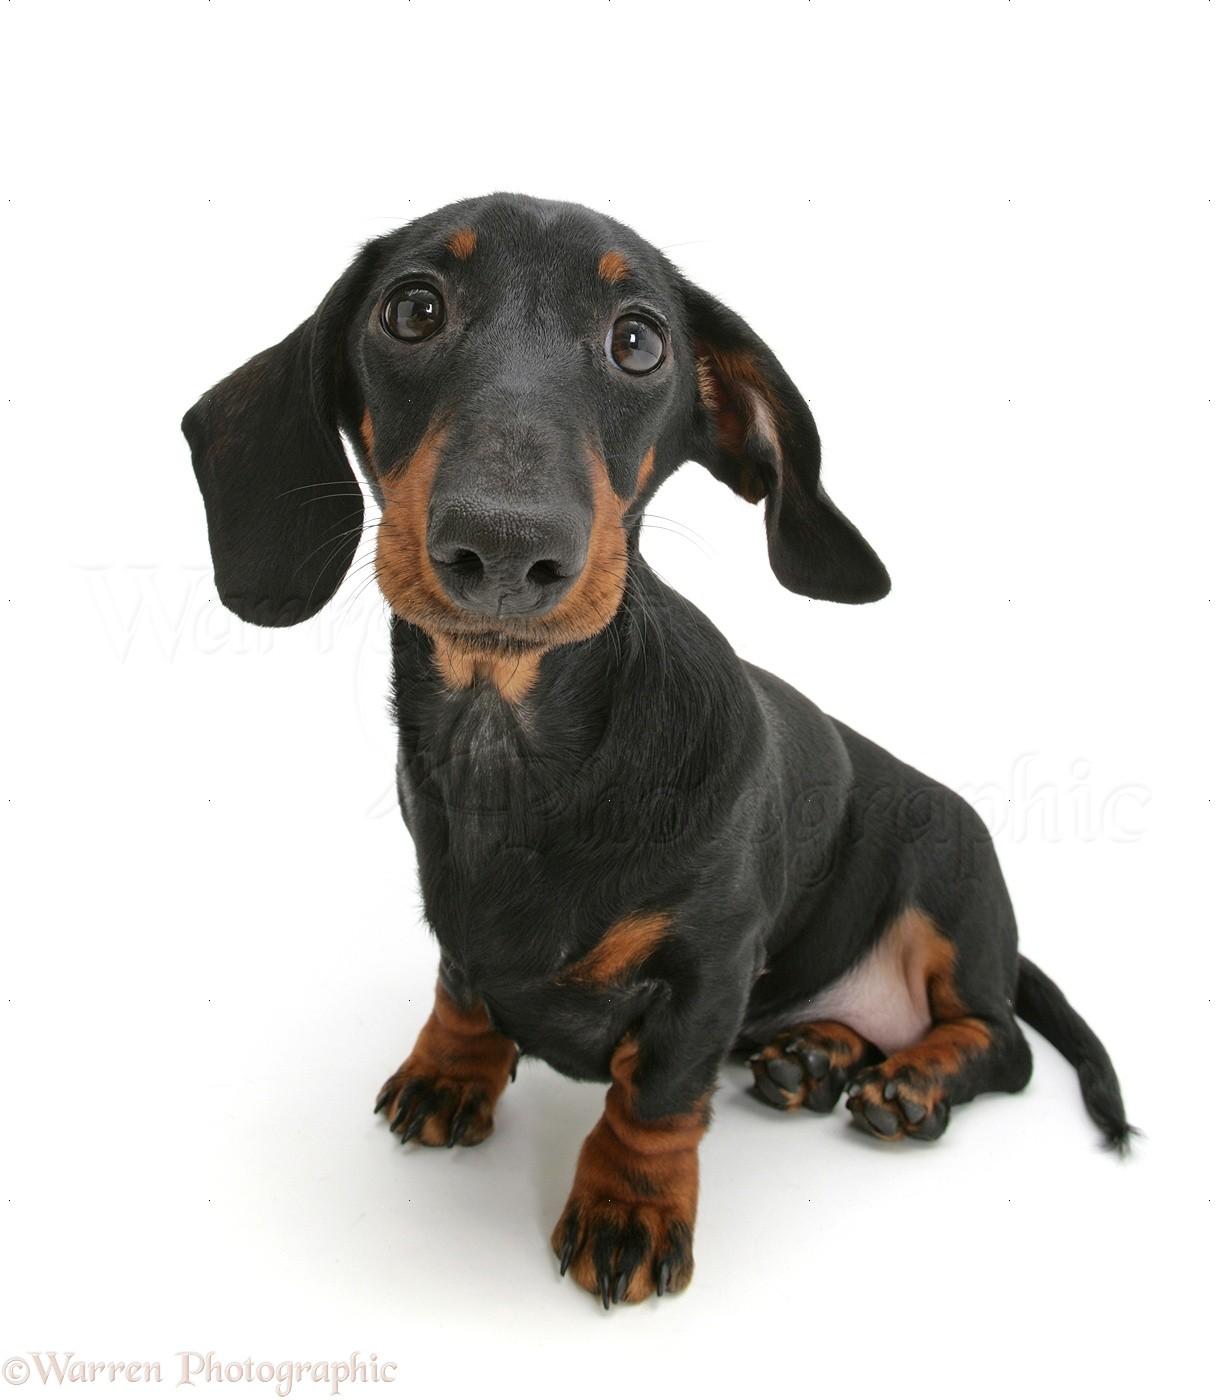 dog black and tan miniature dachshund sitting and